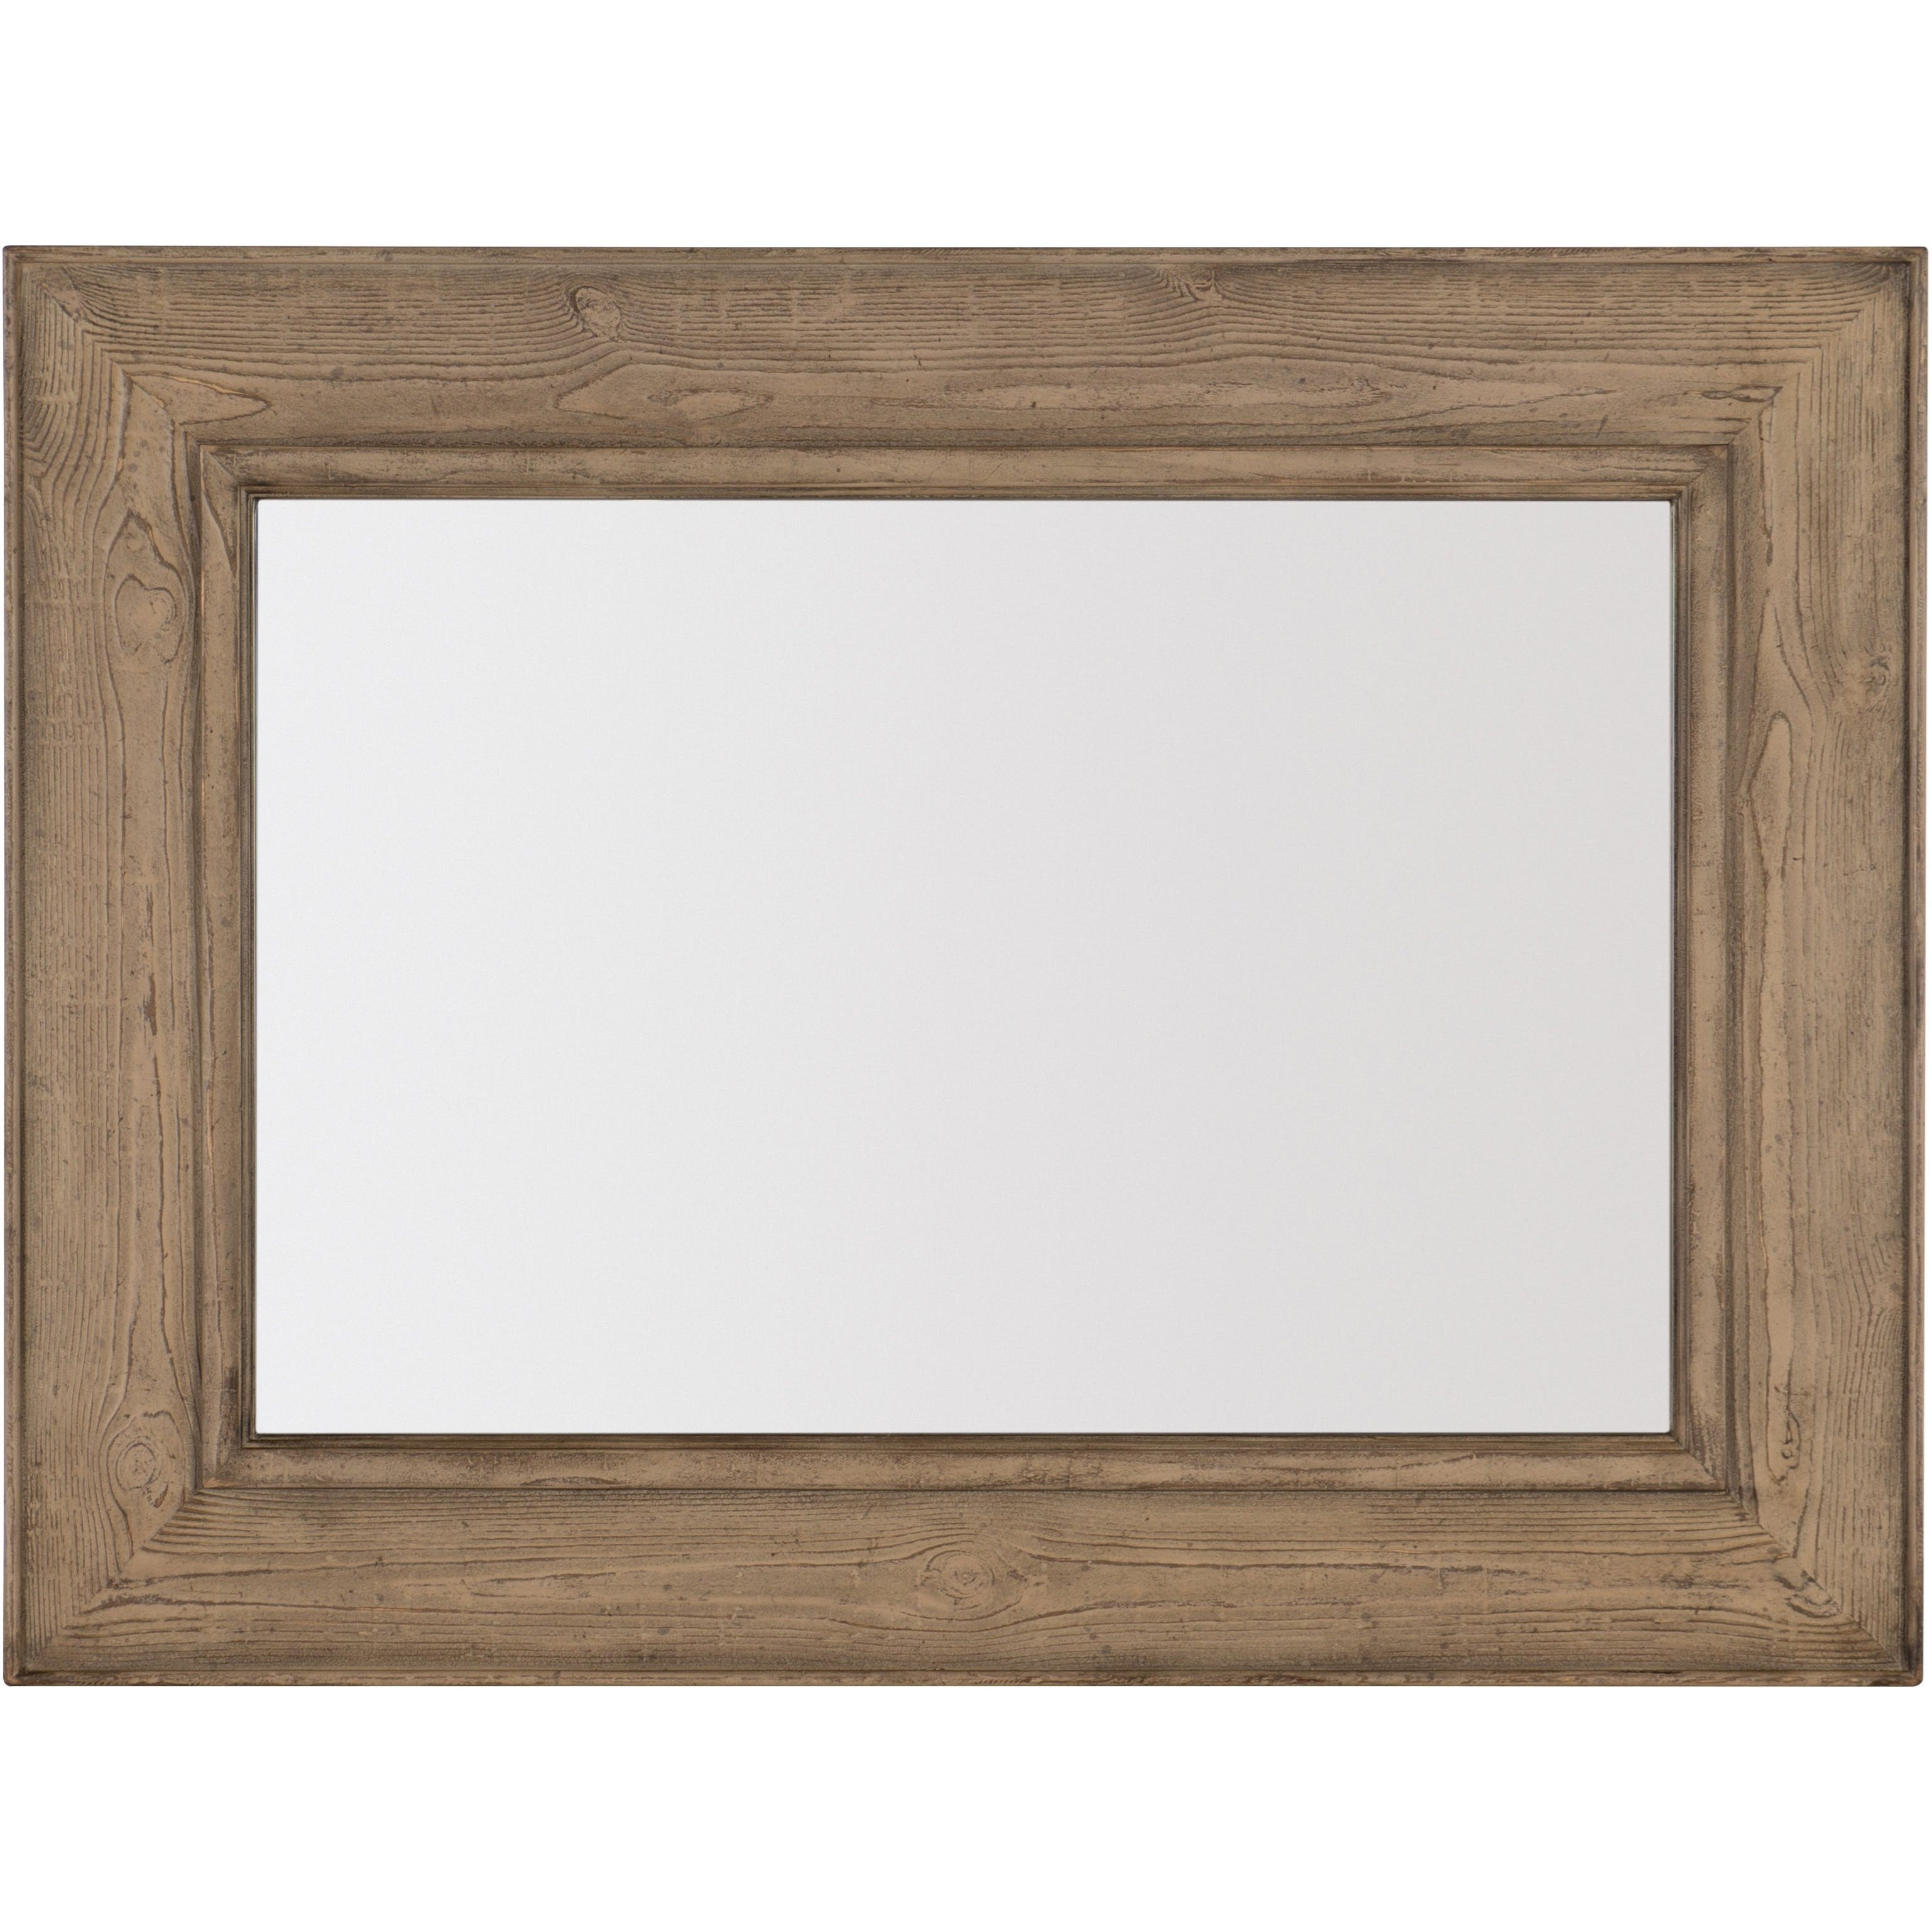 Rustic Landscape Mirror